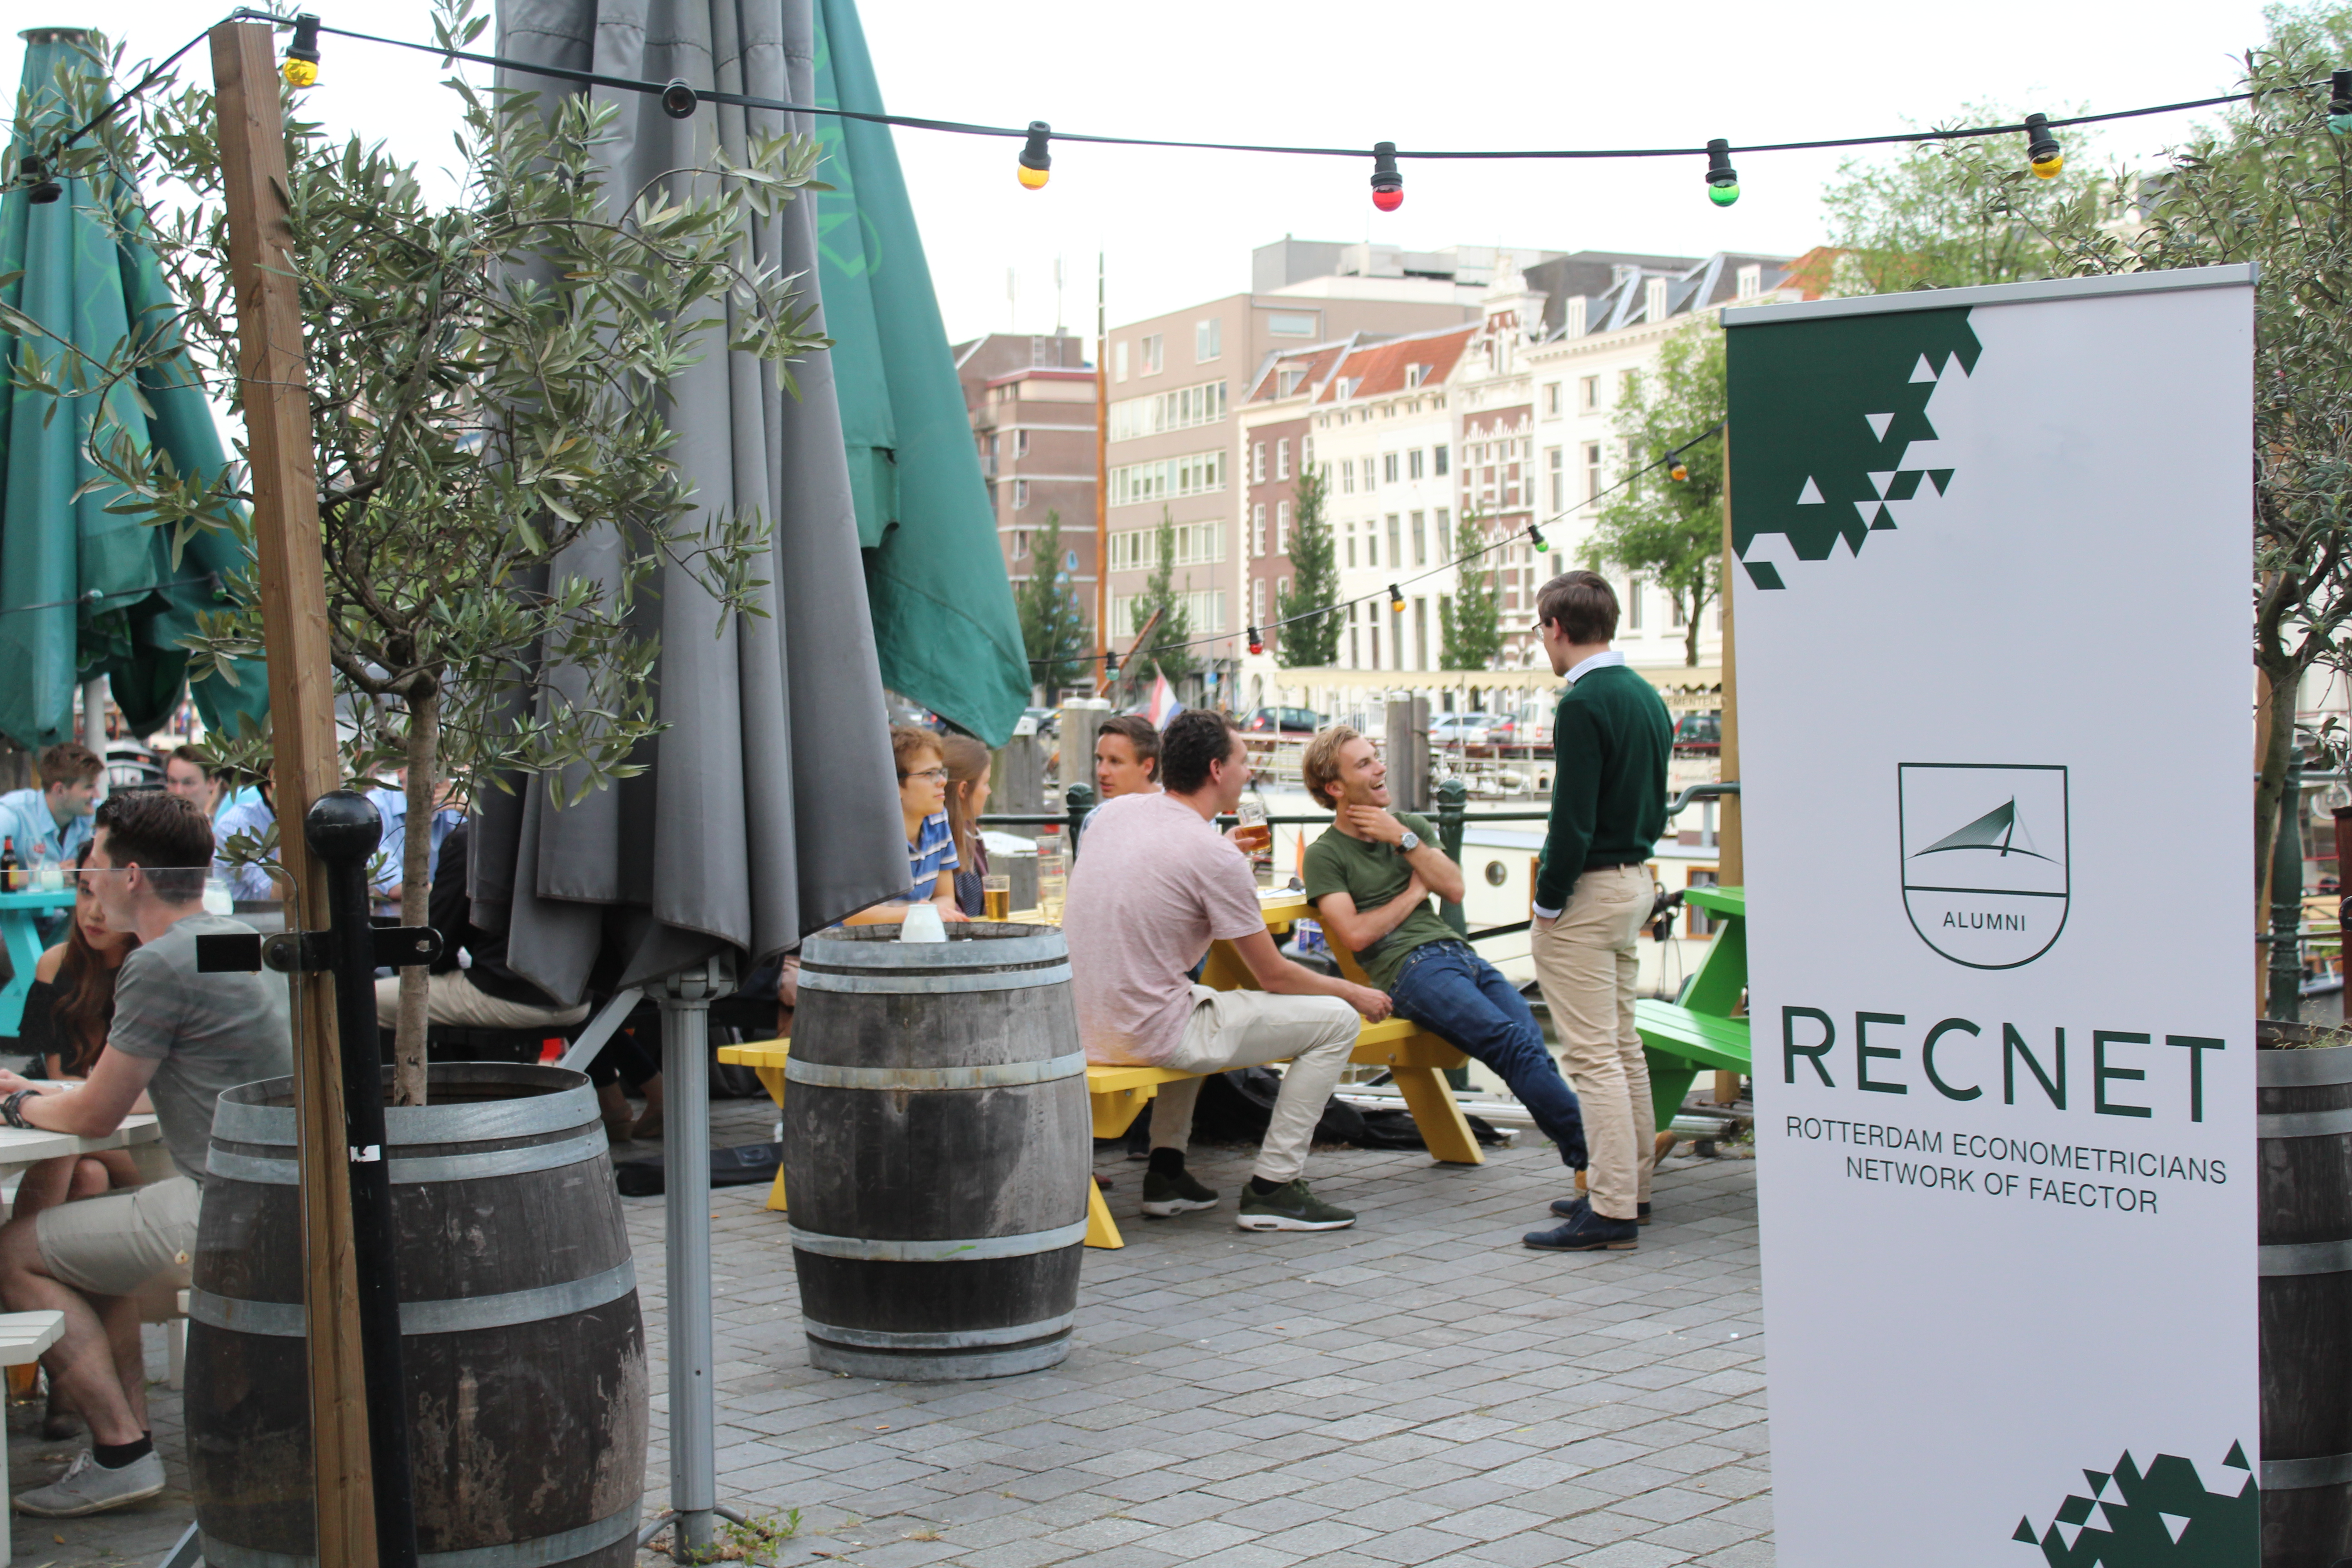 Barbecue Restaurant Rotterdam.P Recnet Bbq 2017 Faector